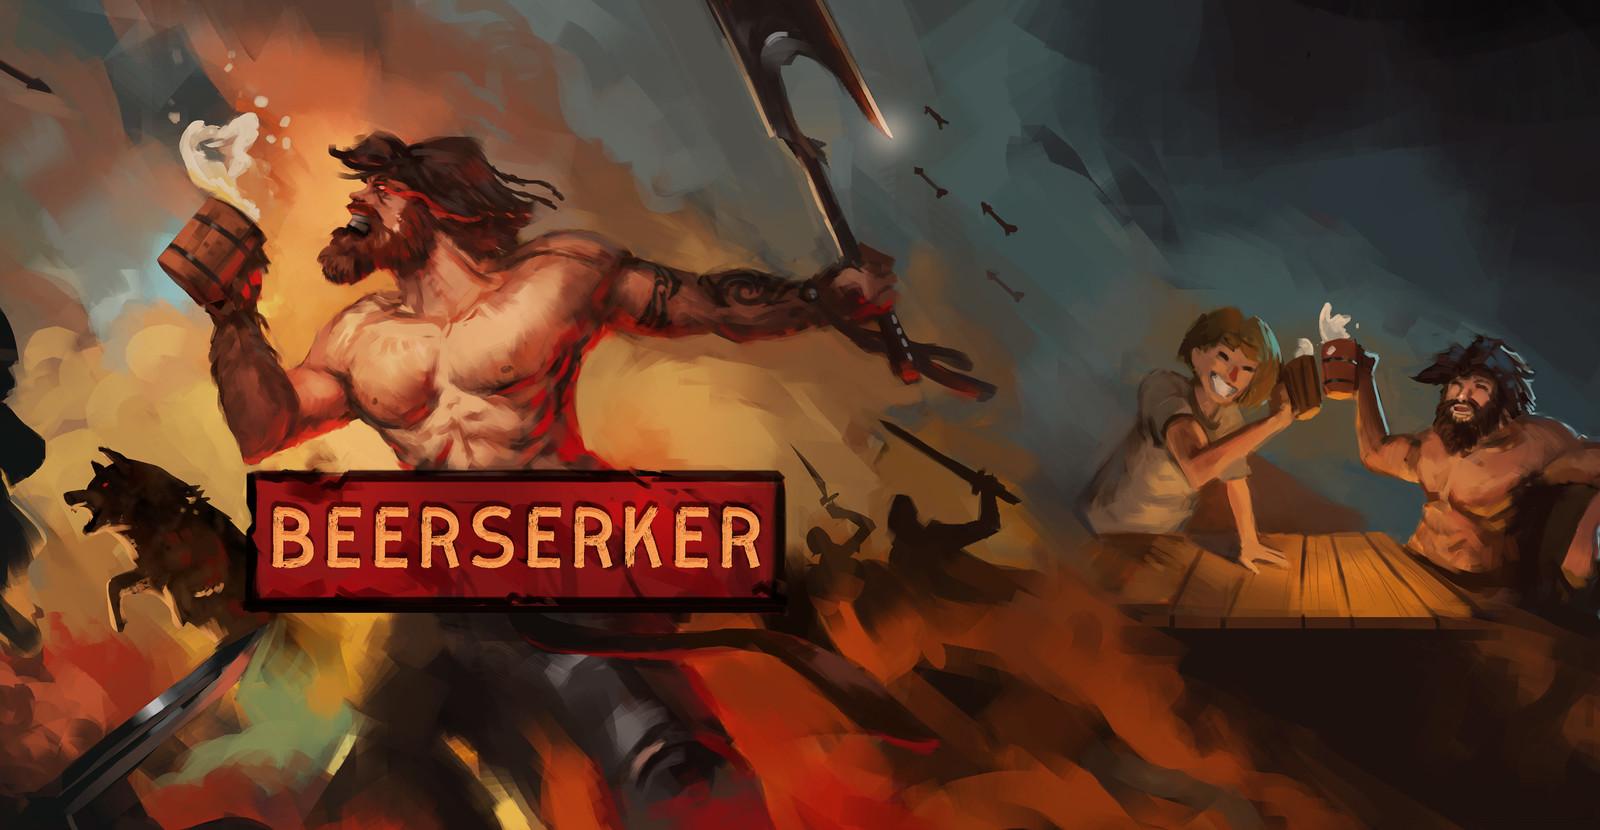 The beerserker